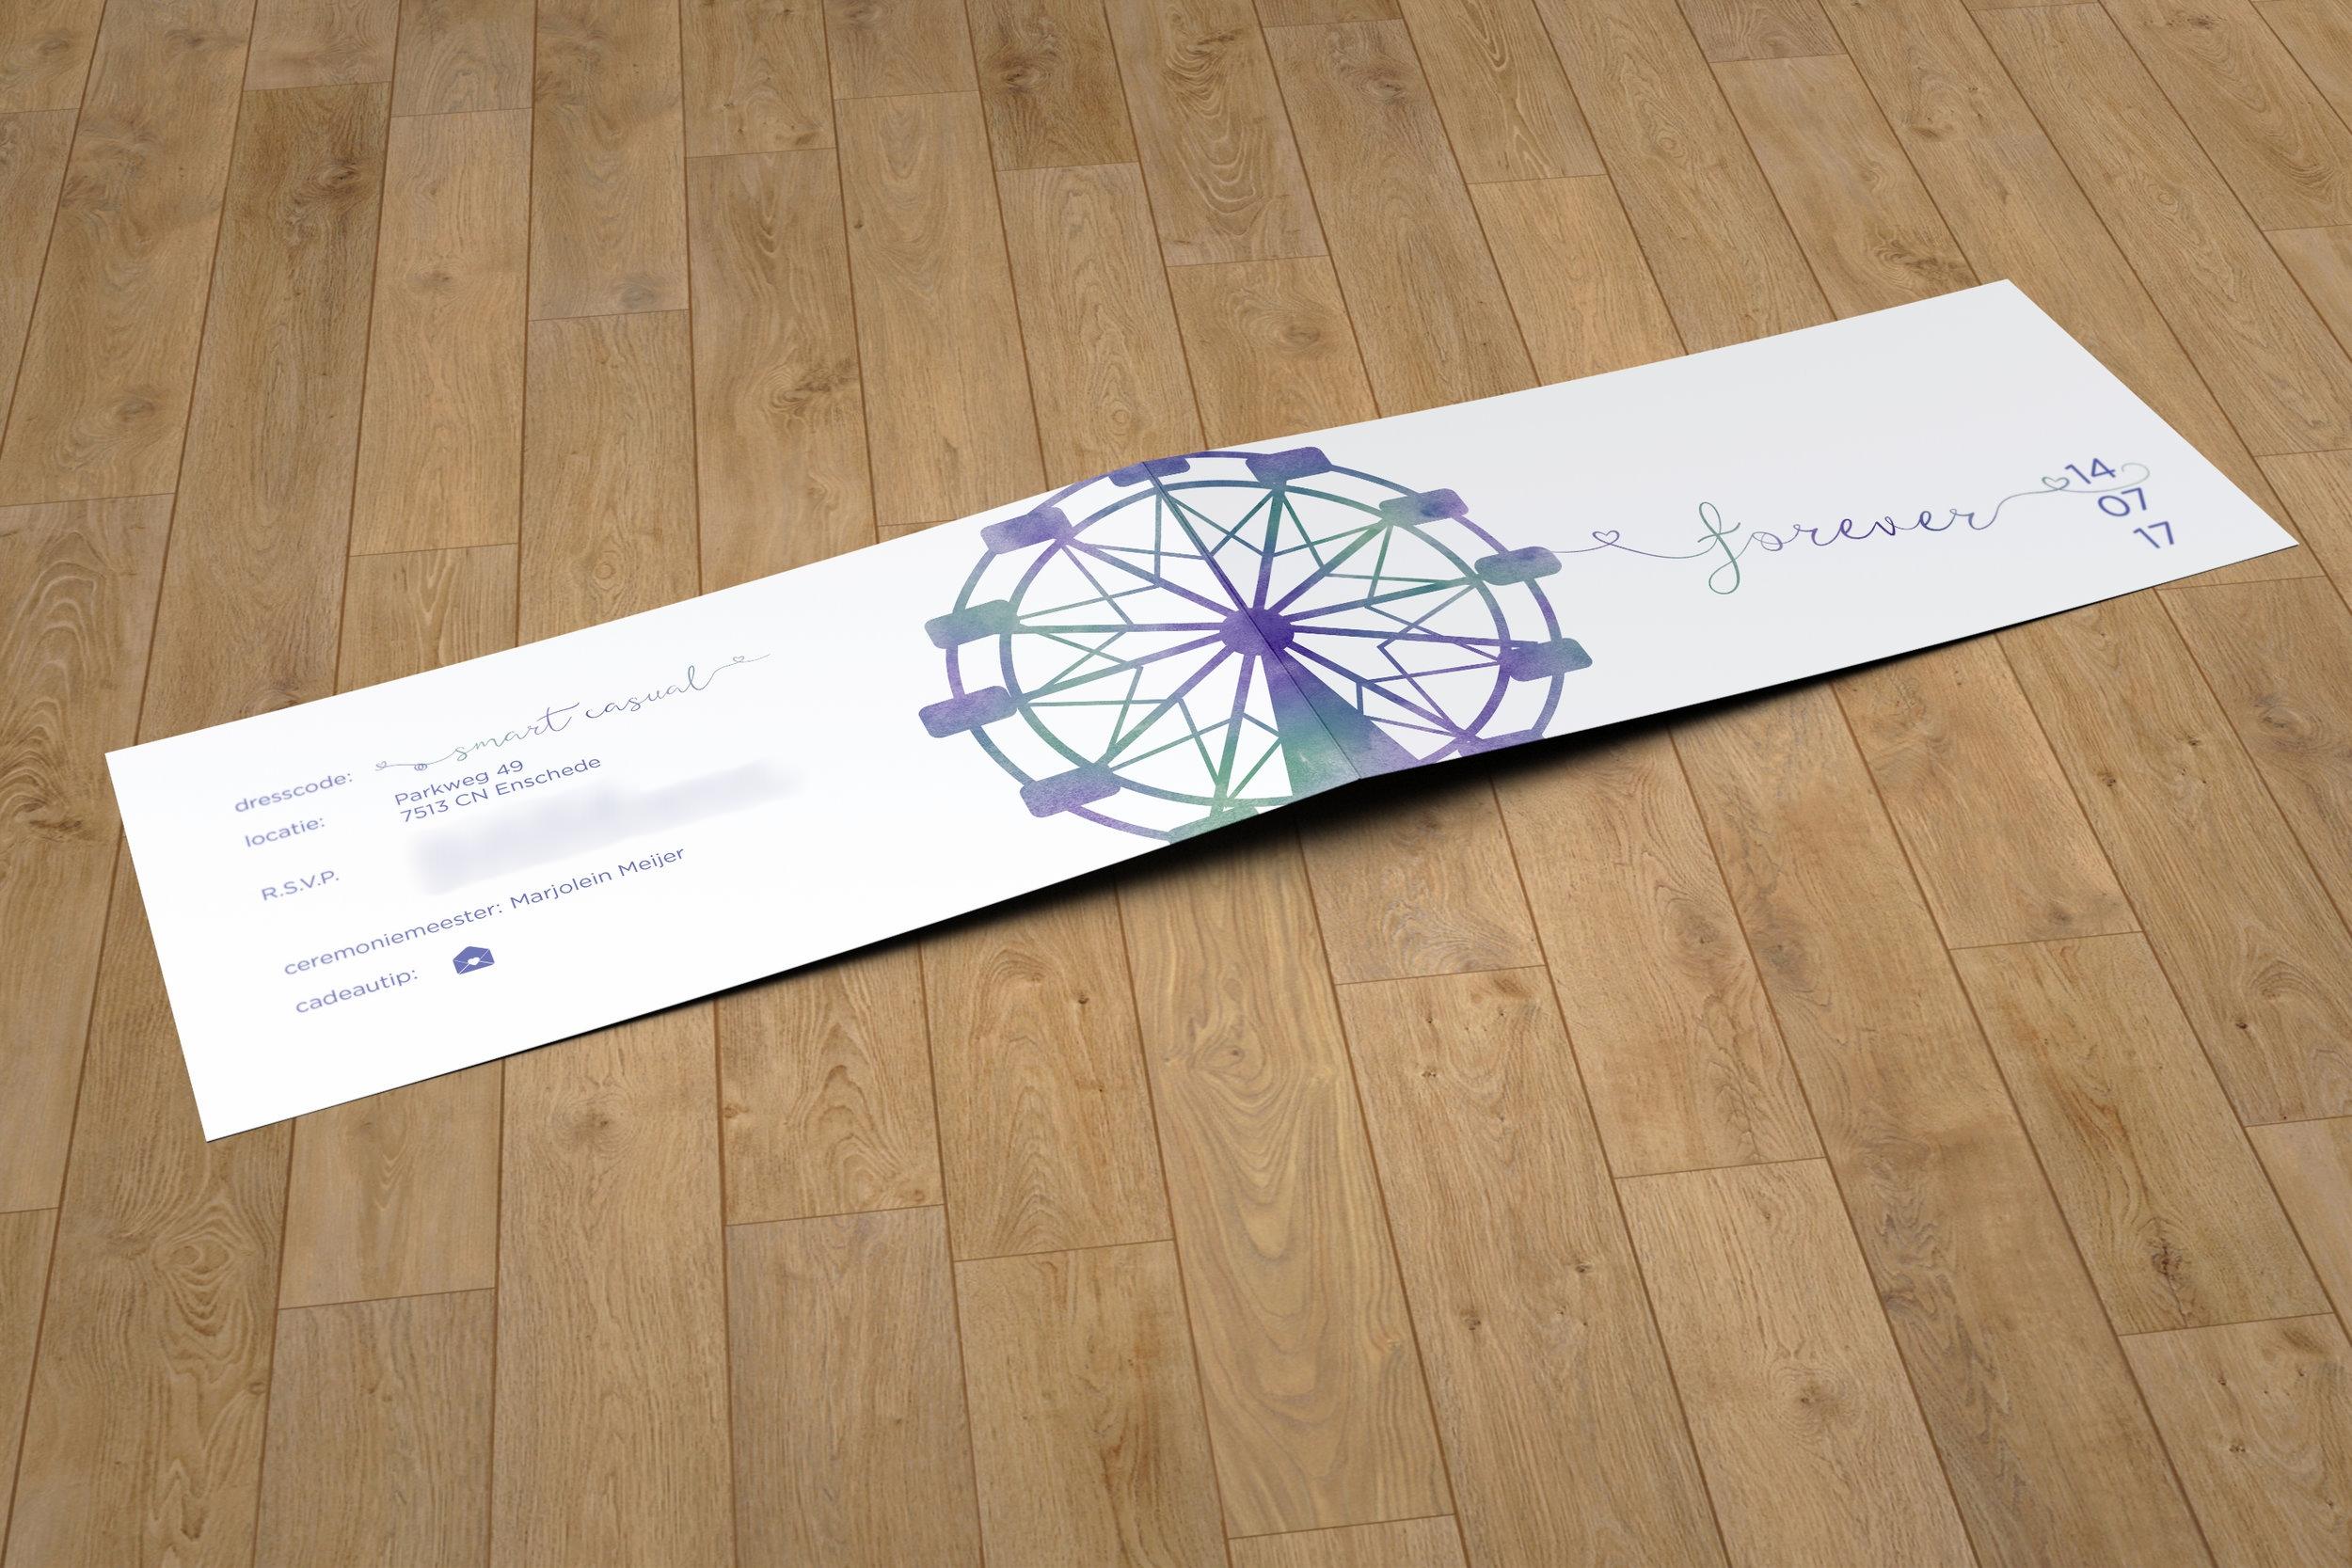 Folded Dl Invitation Card 01.jpg